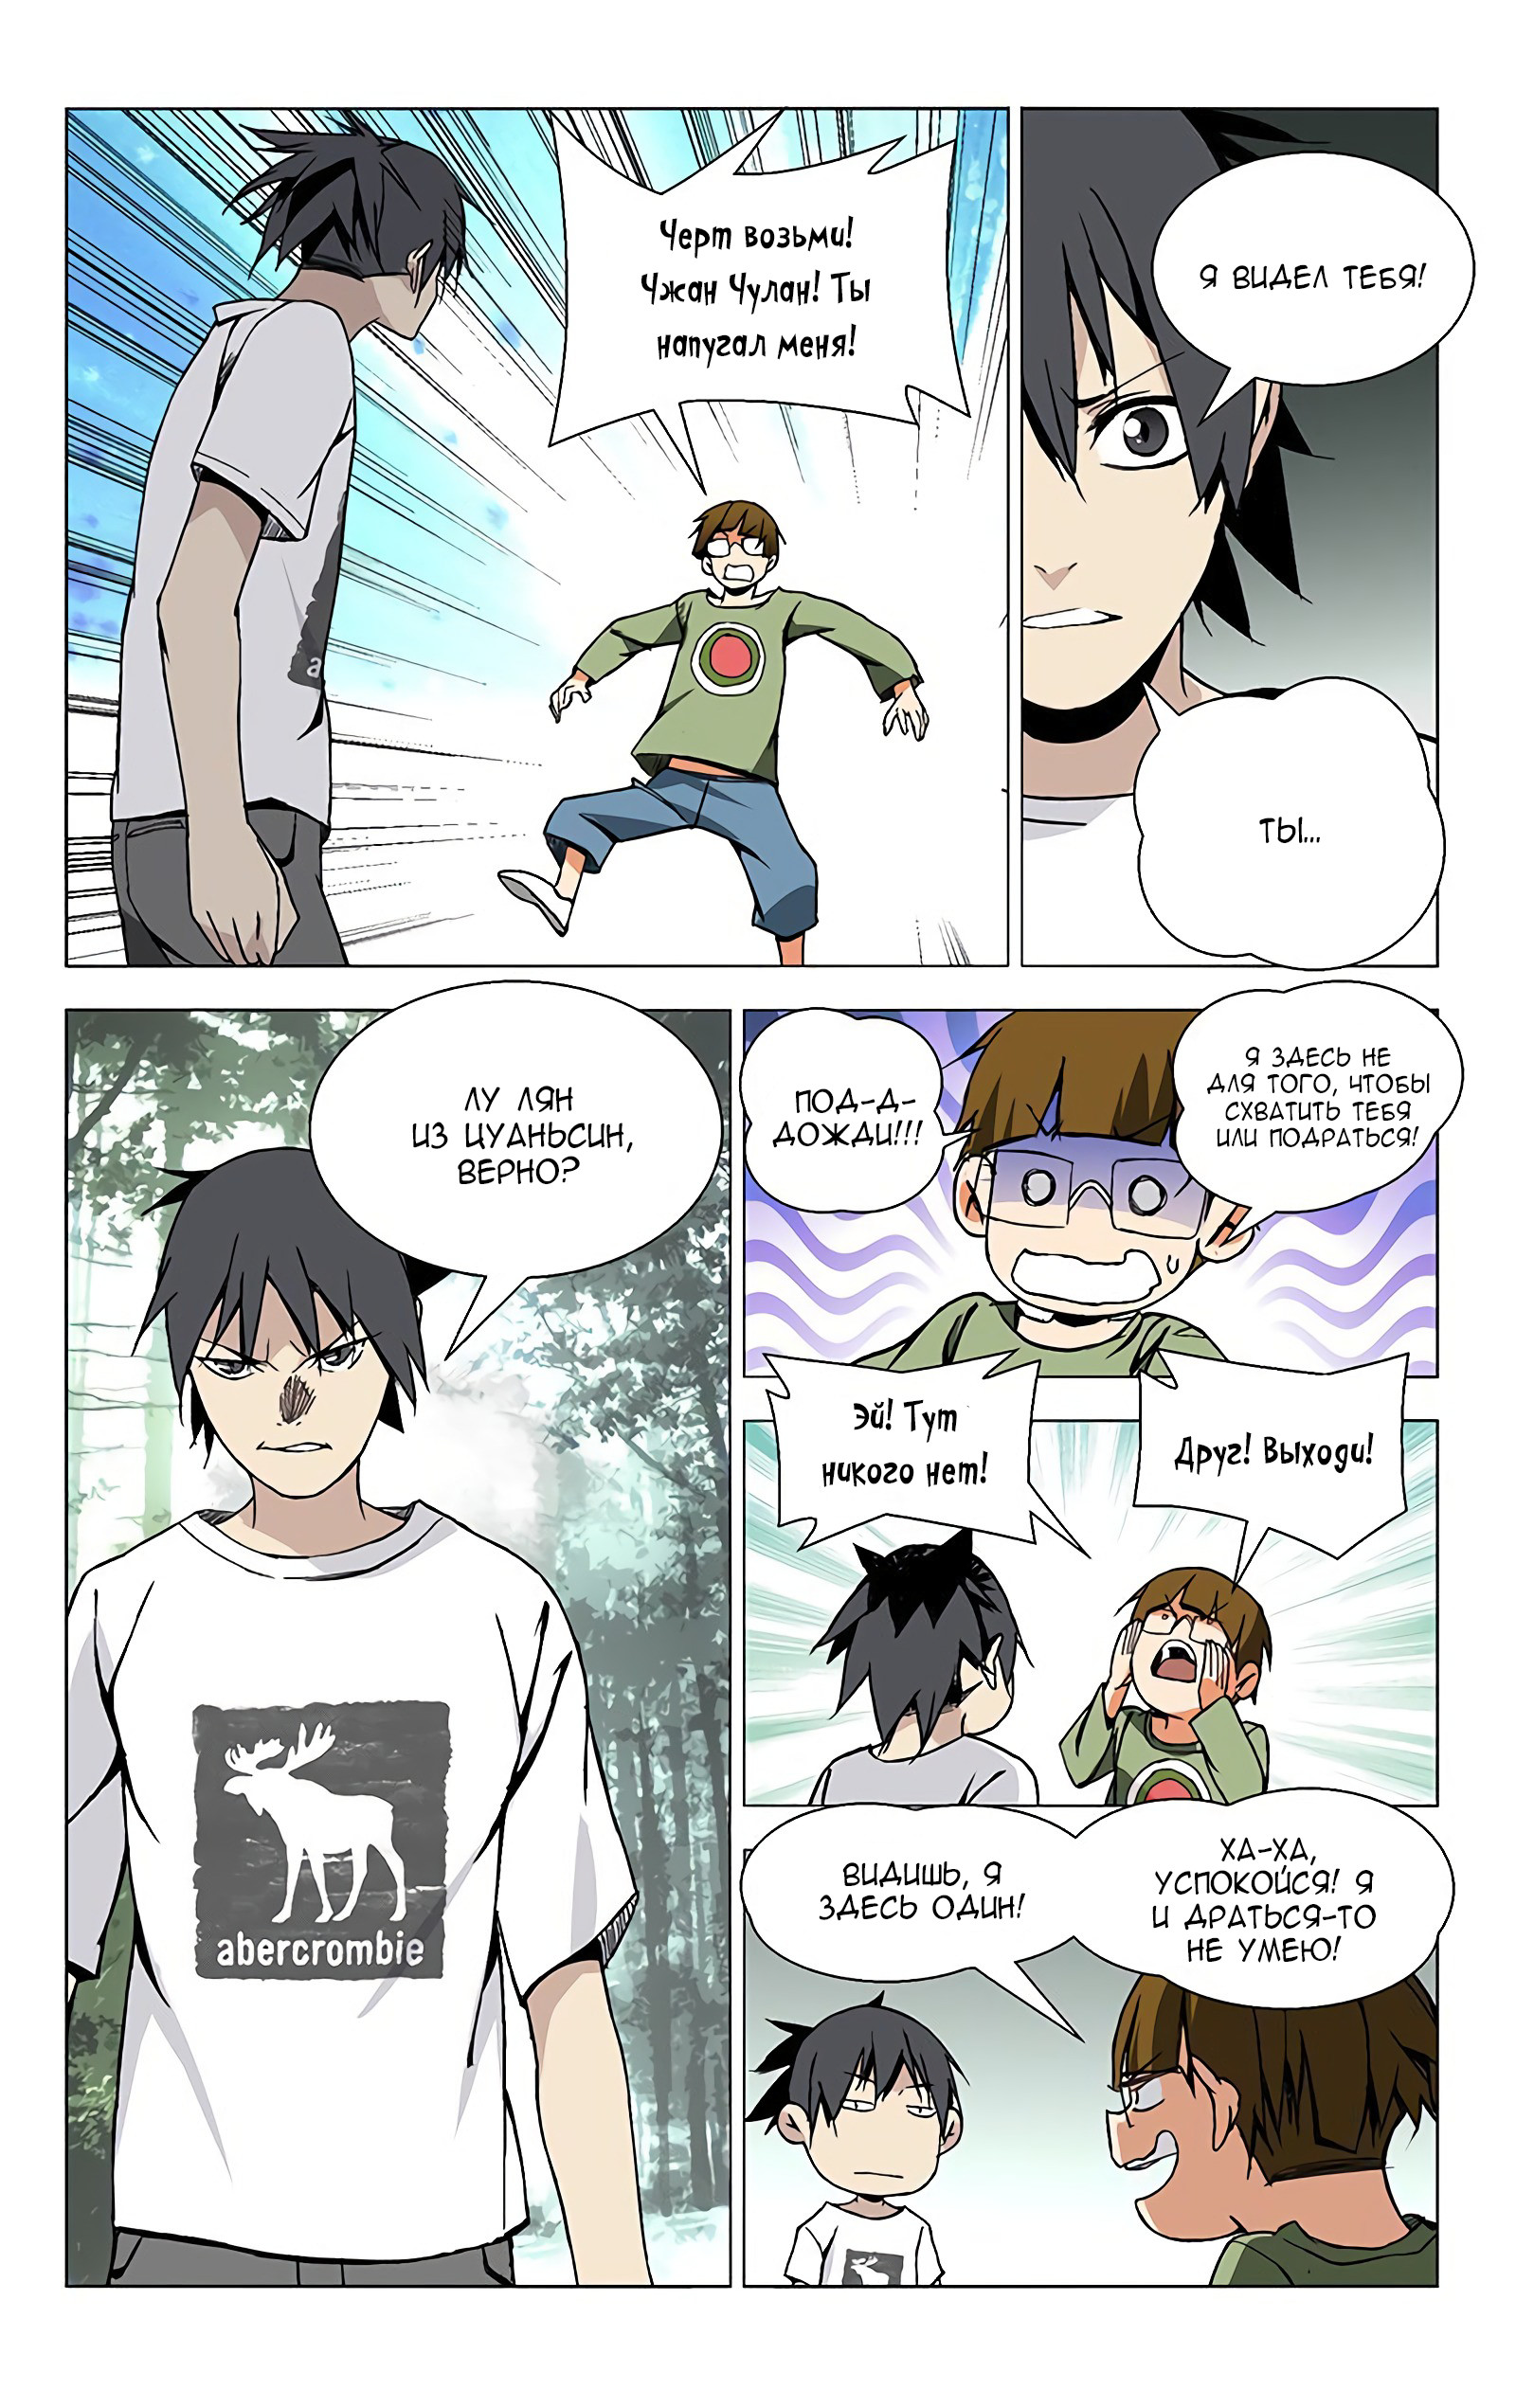 https://r2.ninemanga.com/comics/pic3/39/27047/1302074/1547789148408.jpg Page 1